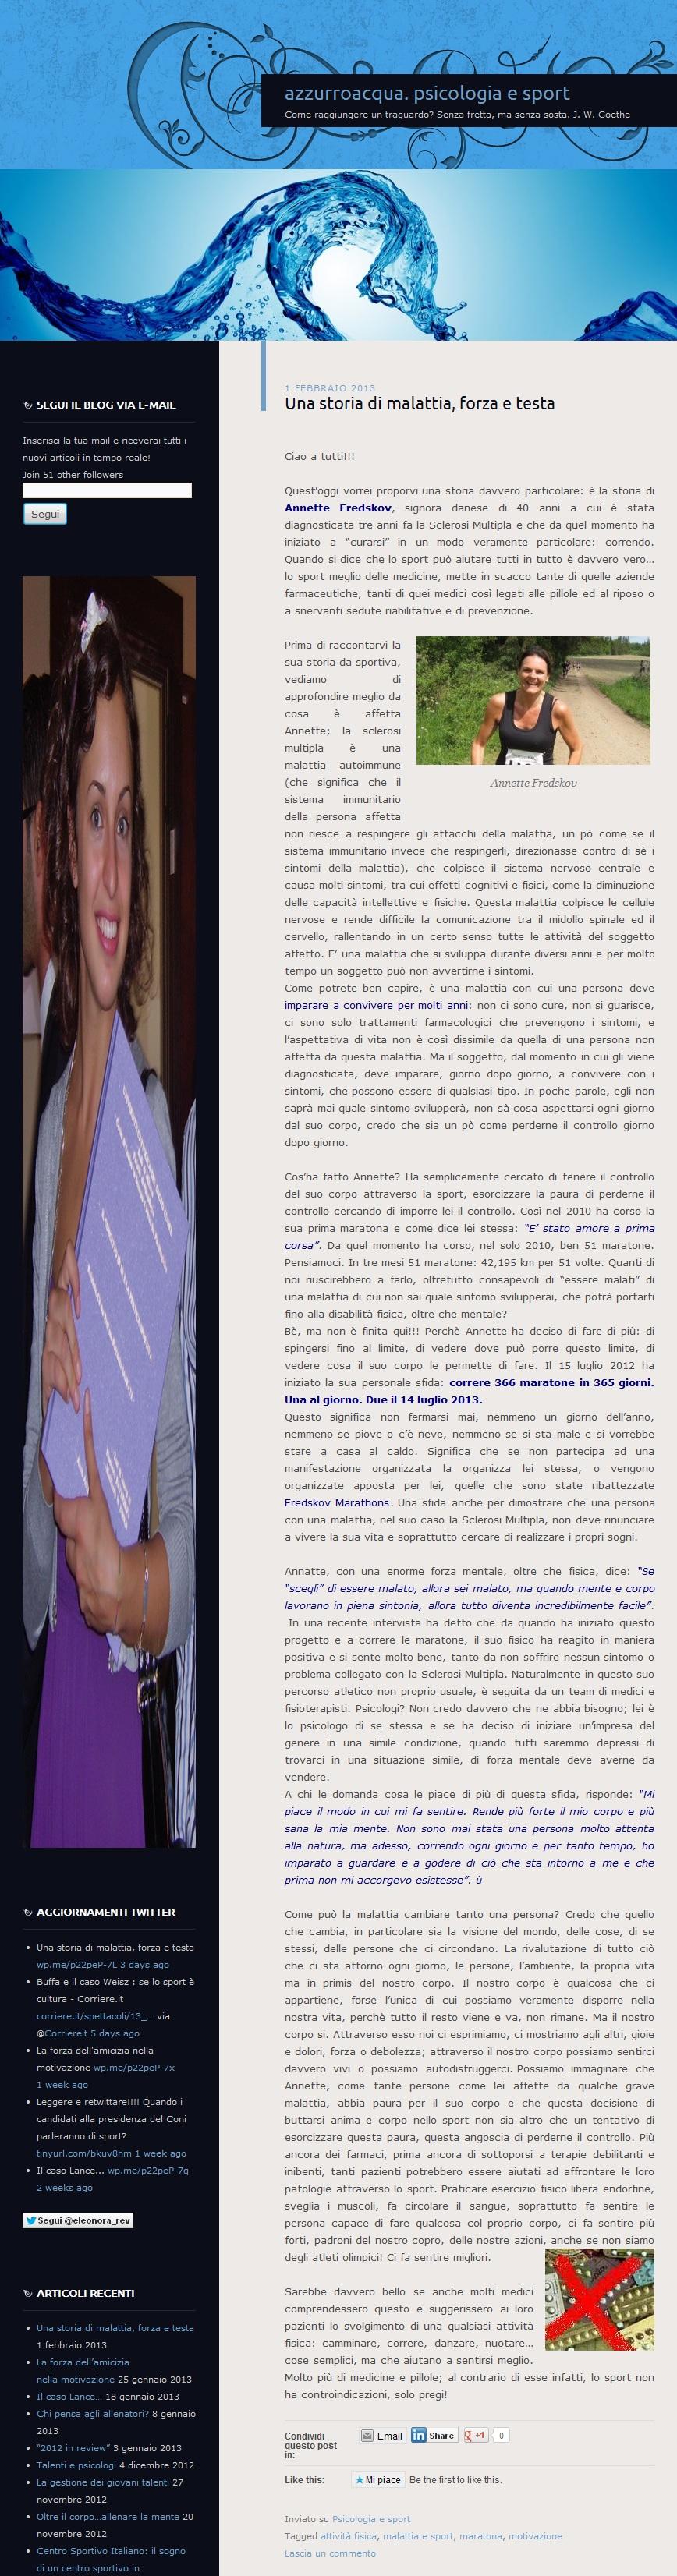 azzurroacqua.wordpress.com 2013.02.01 italiensk